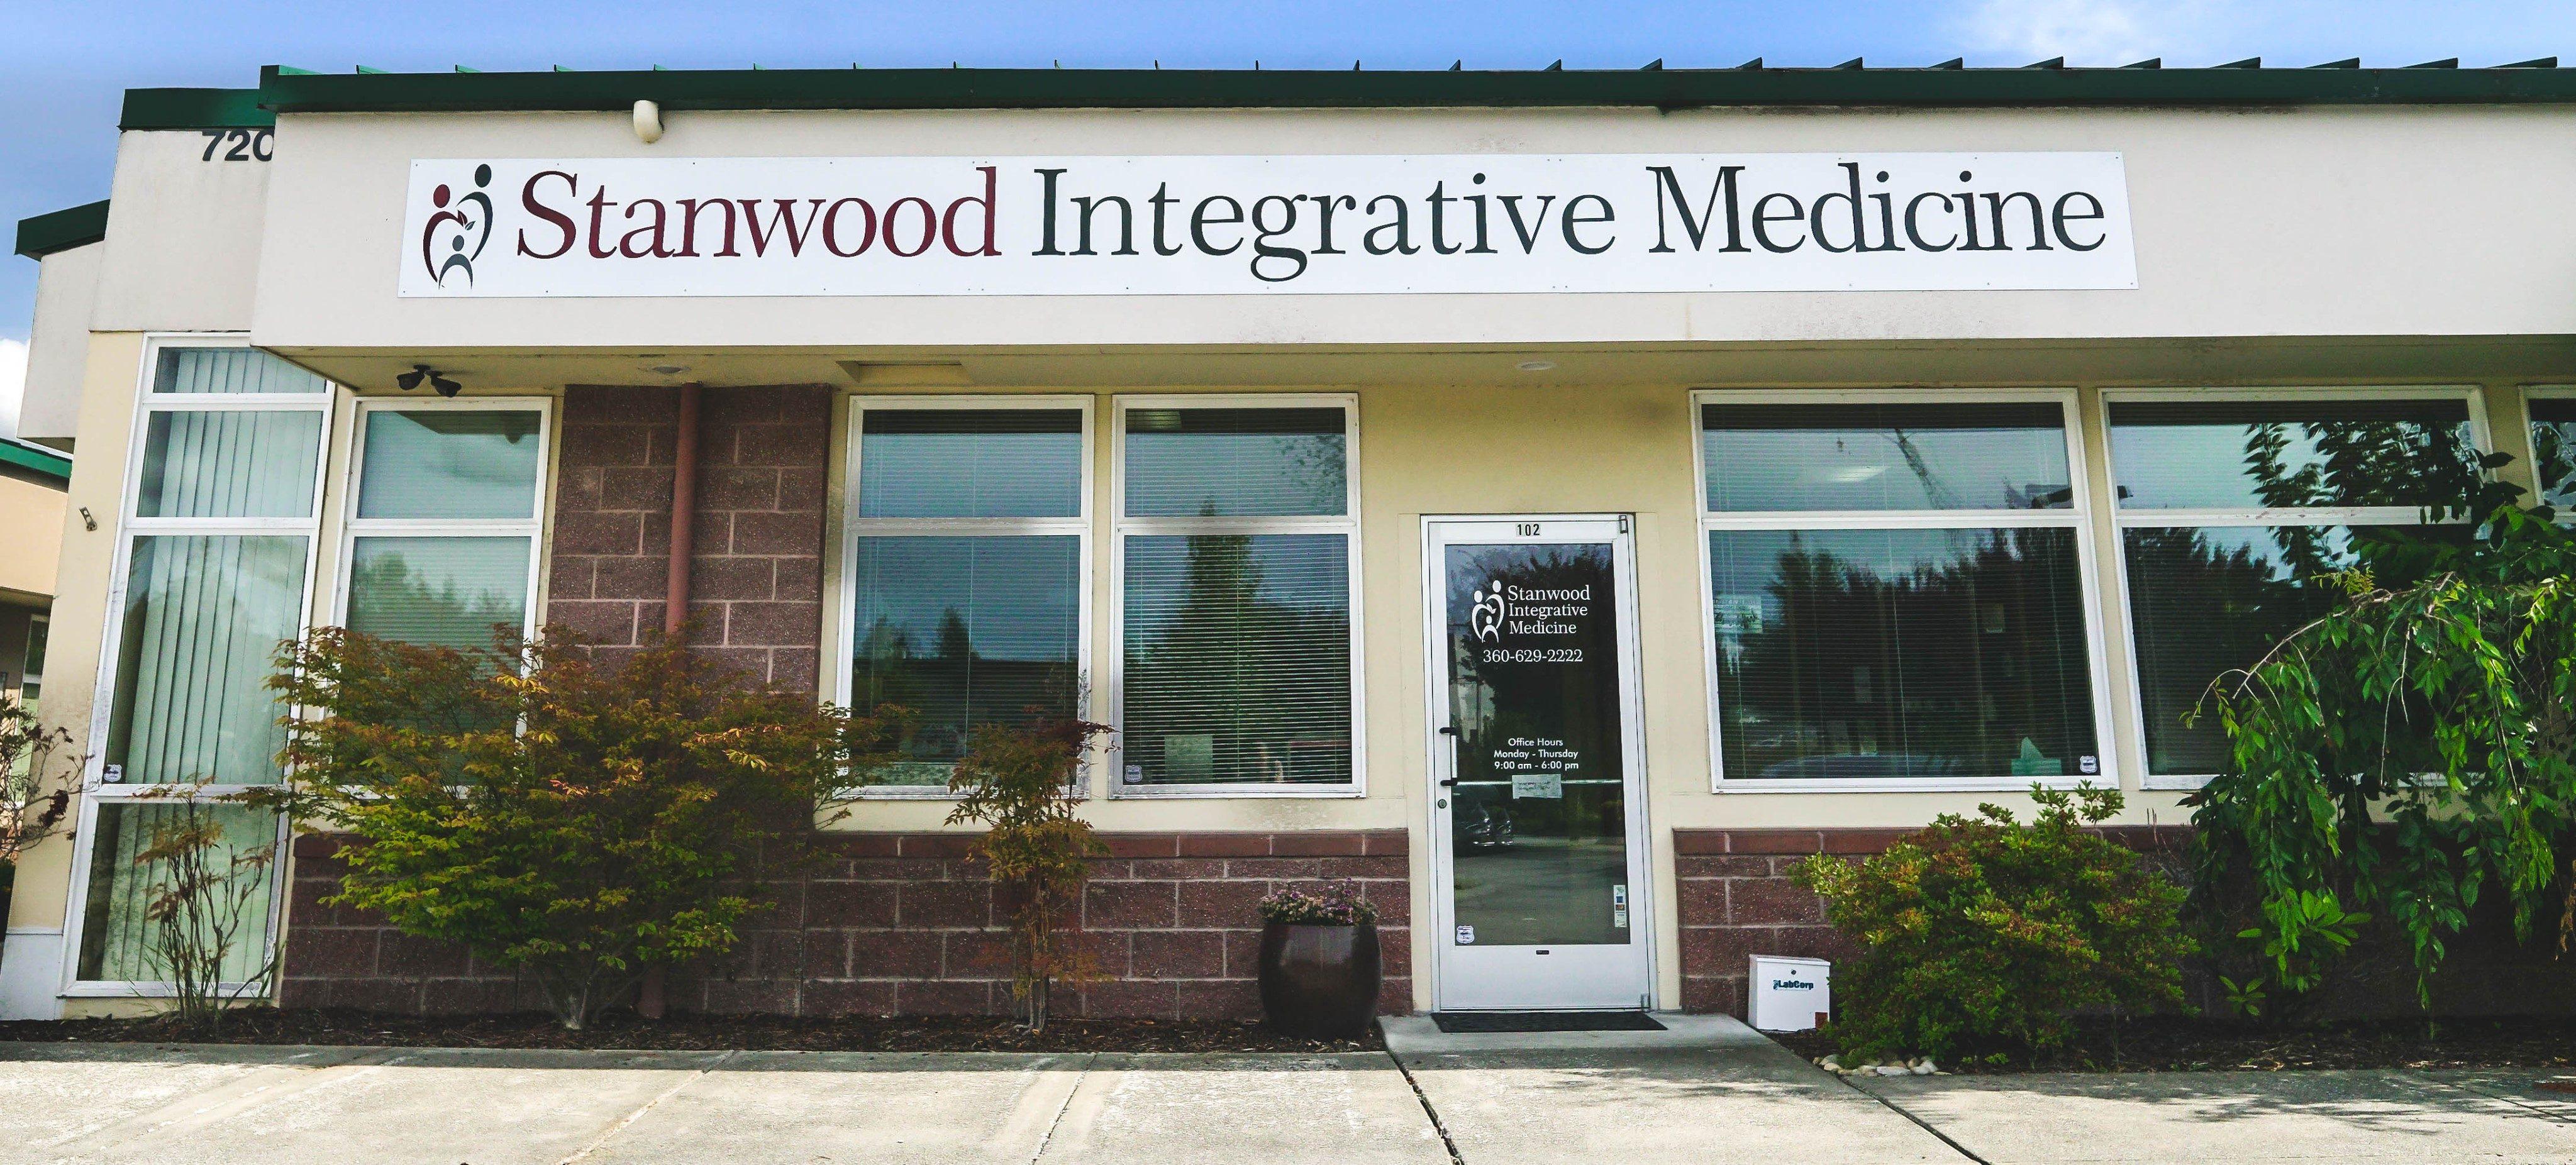 Stanwood Integrative Medicine front of building